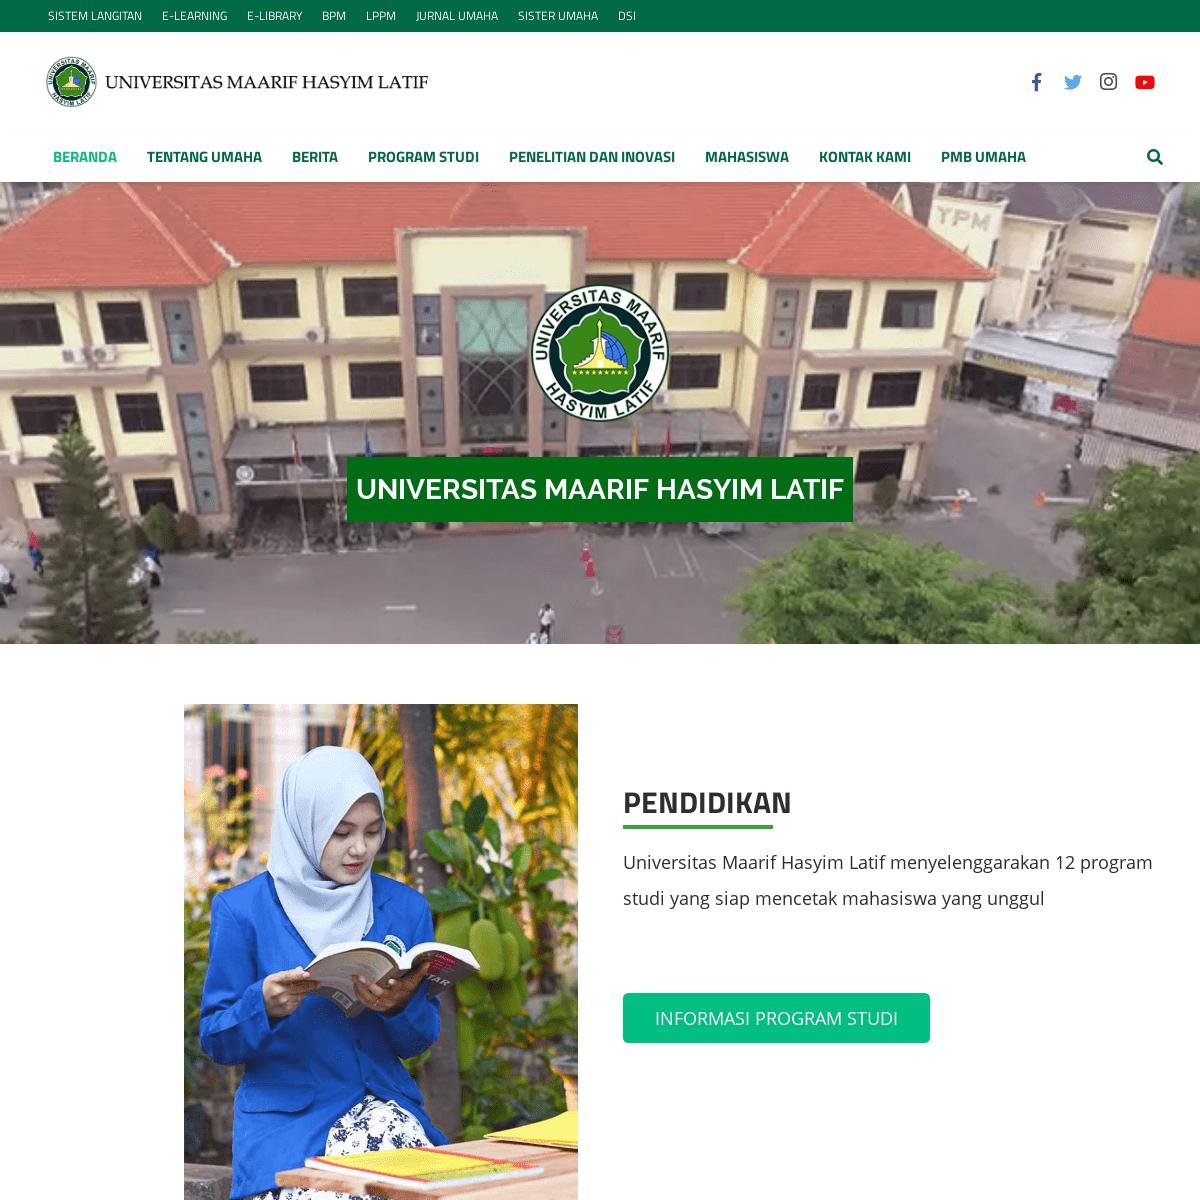 ArchiveBay.com - umaha.ac.id - UMAHA - Universitas Maarif Hasyim Latif